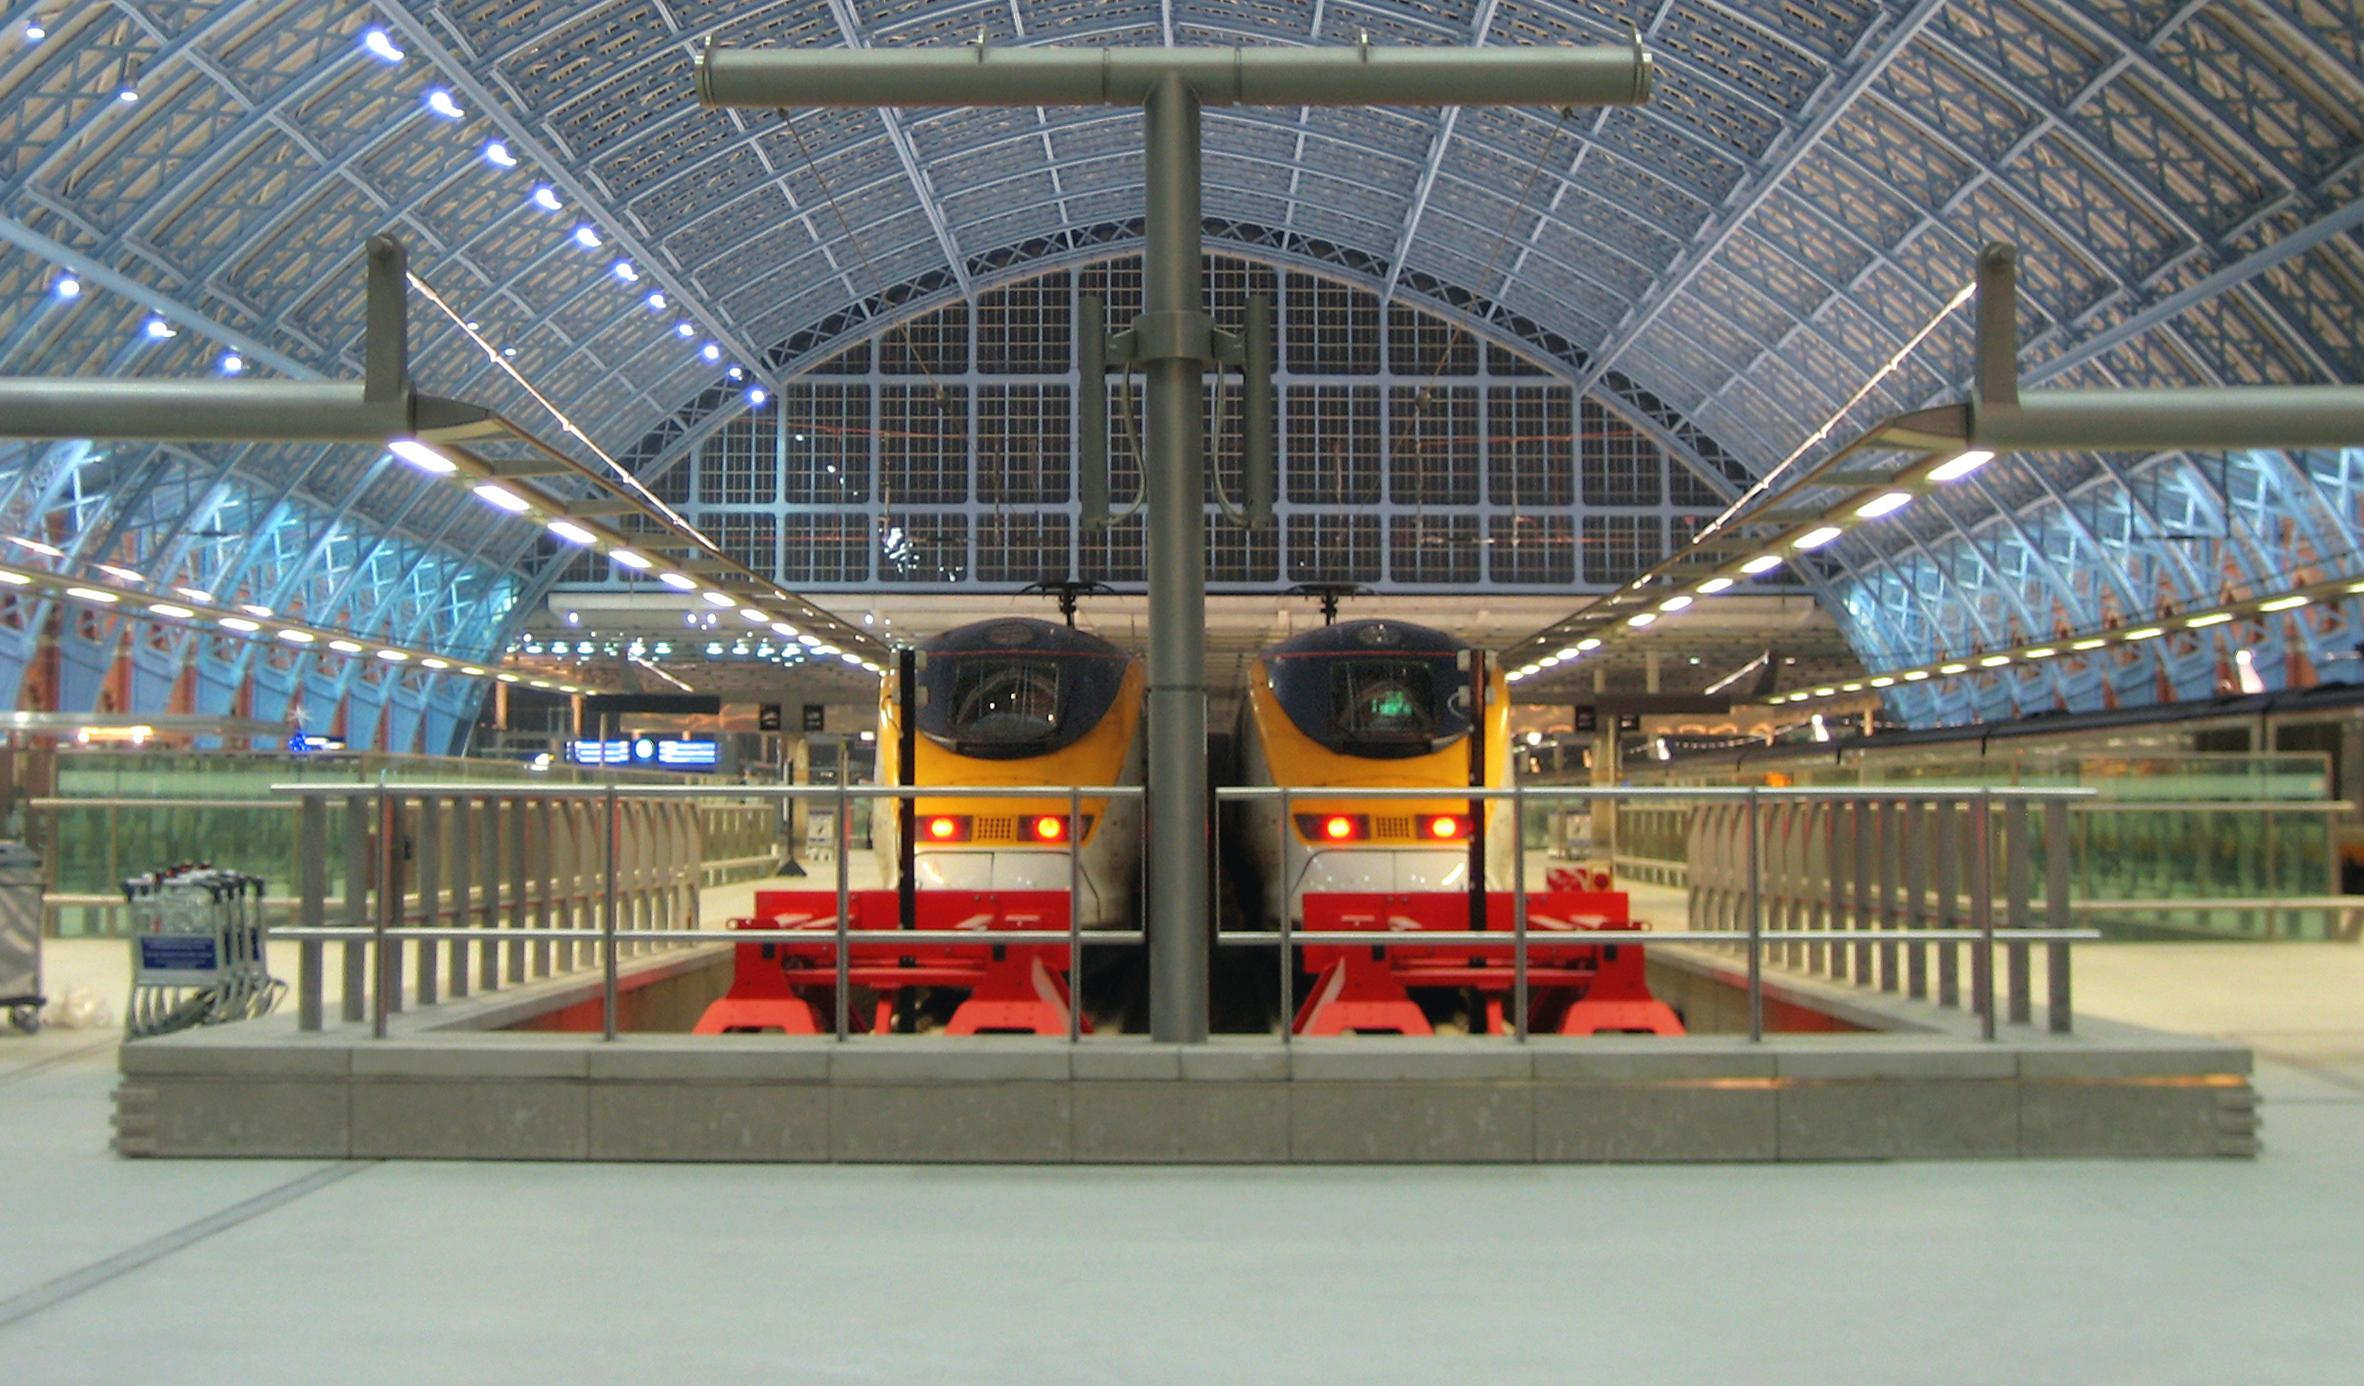 2 Eurostar trains at London St Pancras